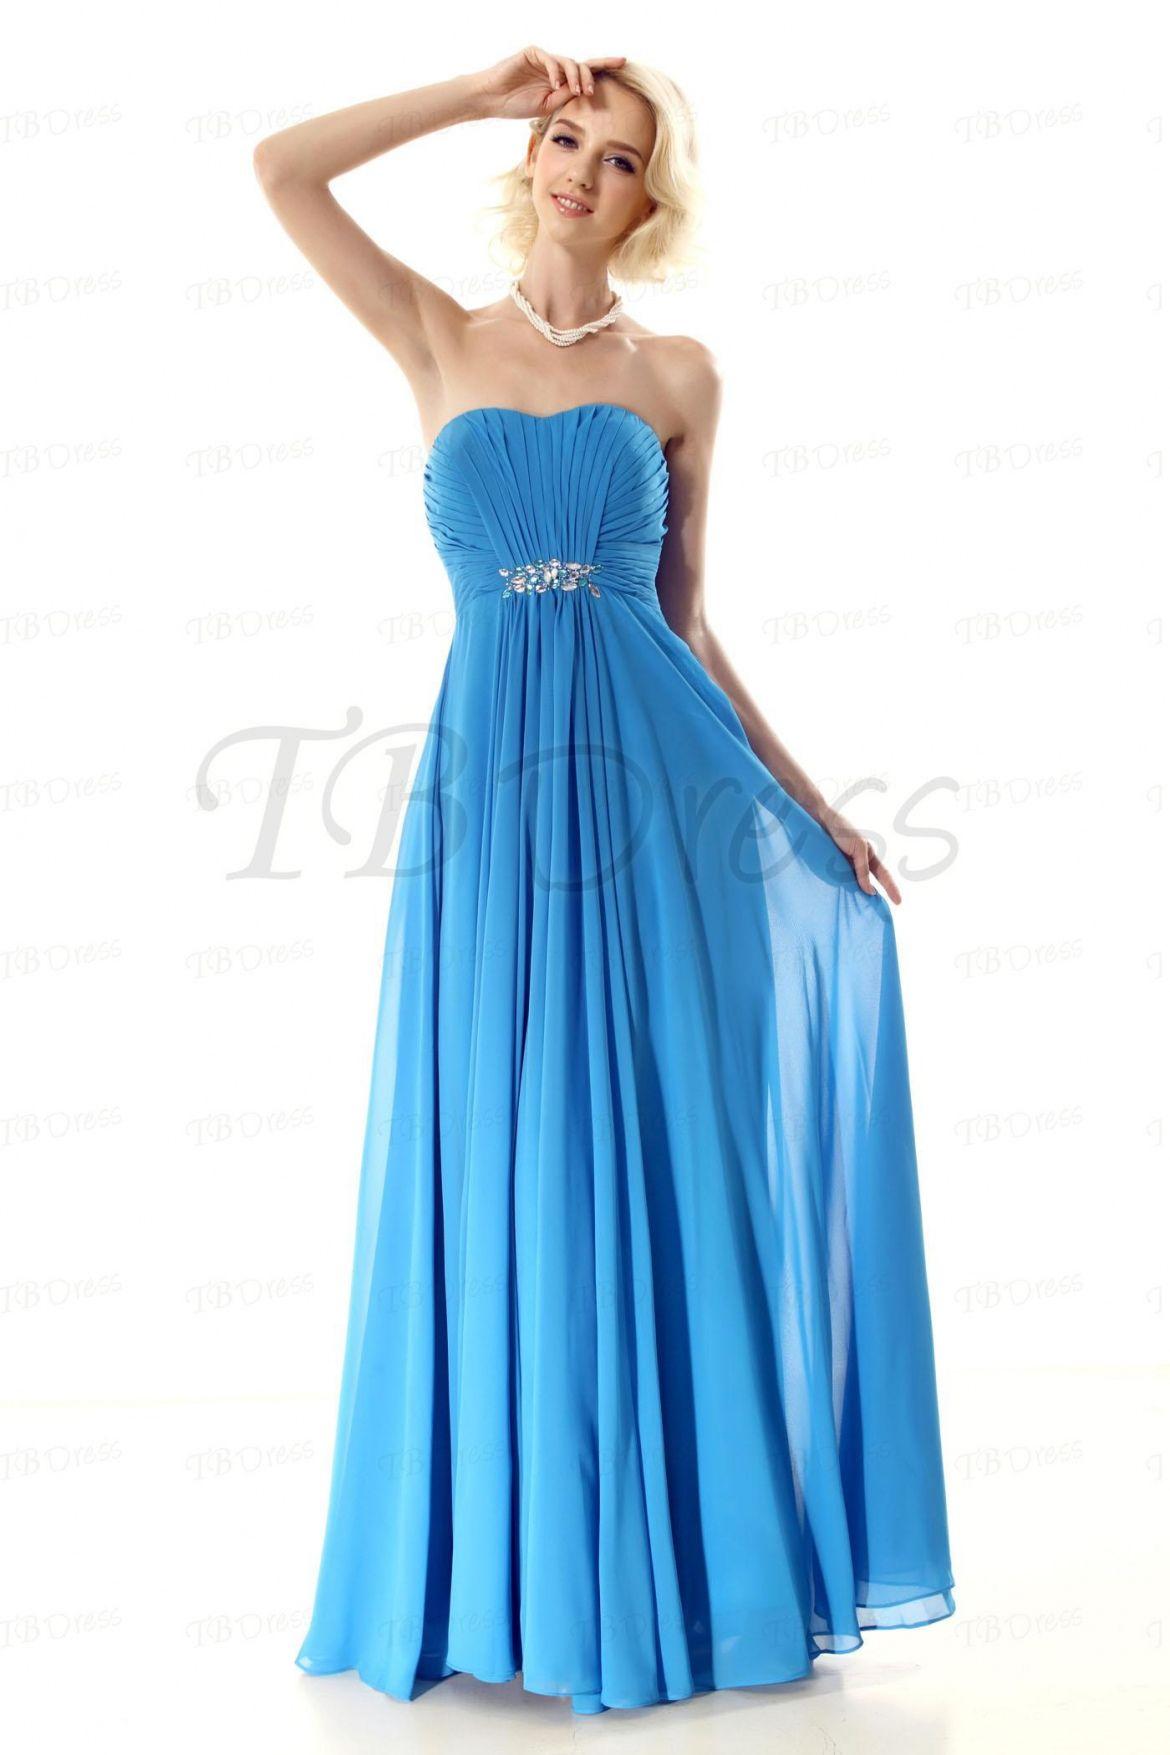 55 Cheap Wedding Dresses Under 50 Dollars Wedding Dresses For The